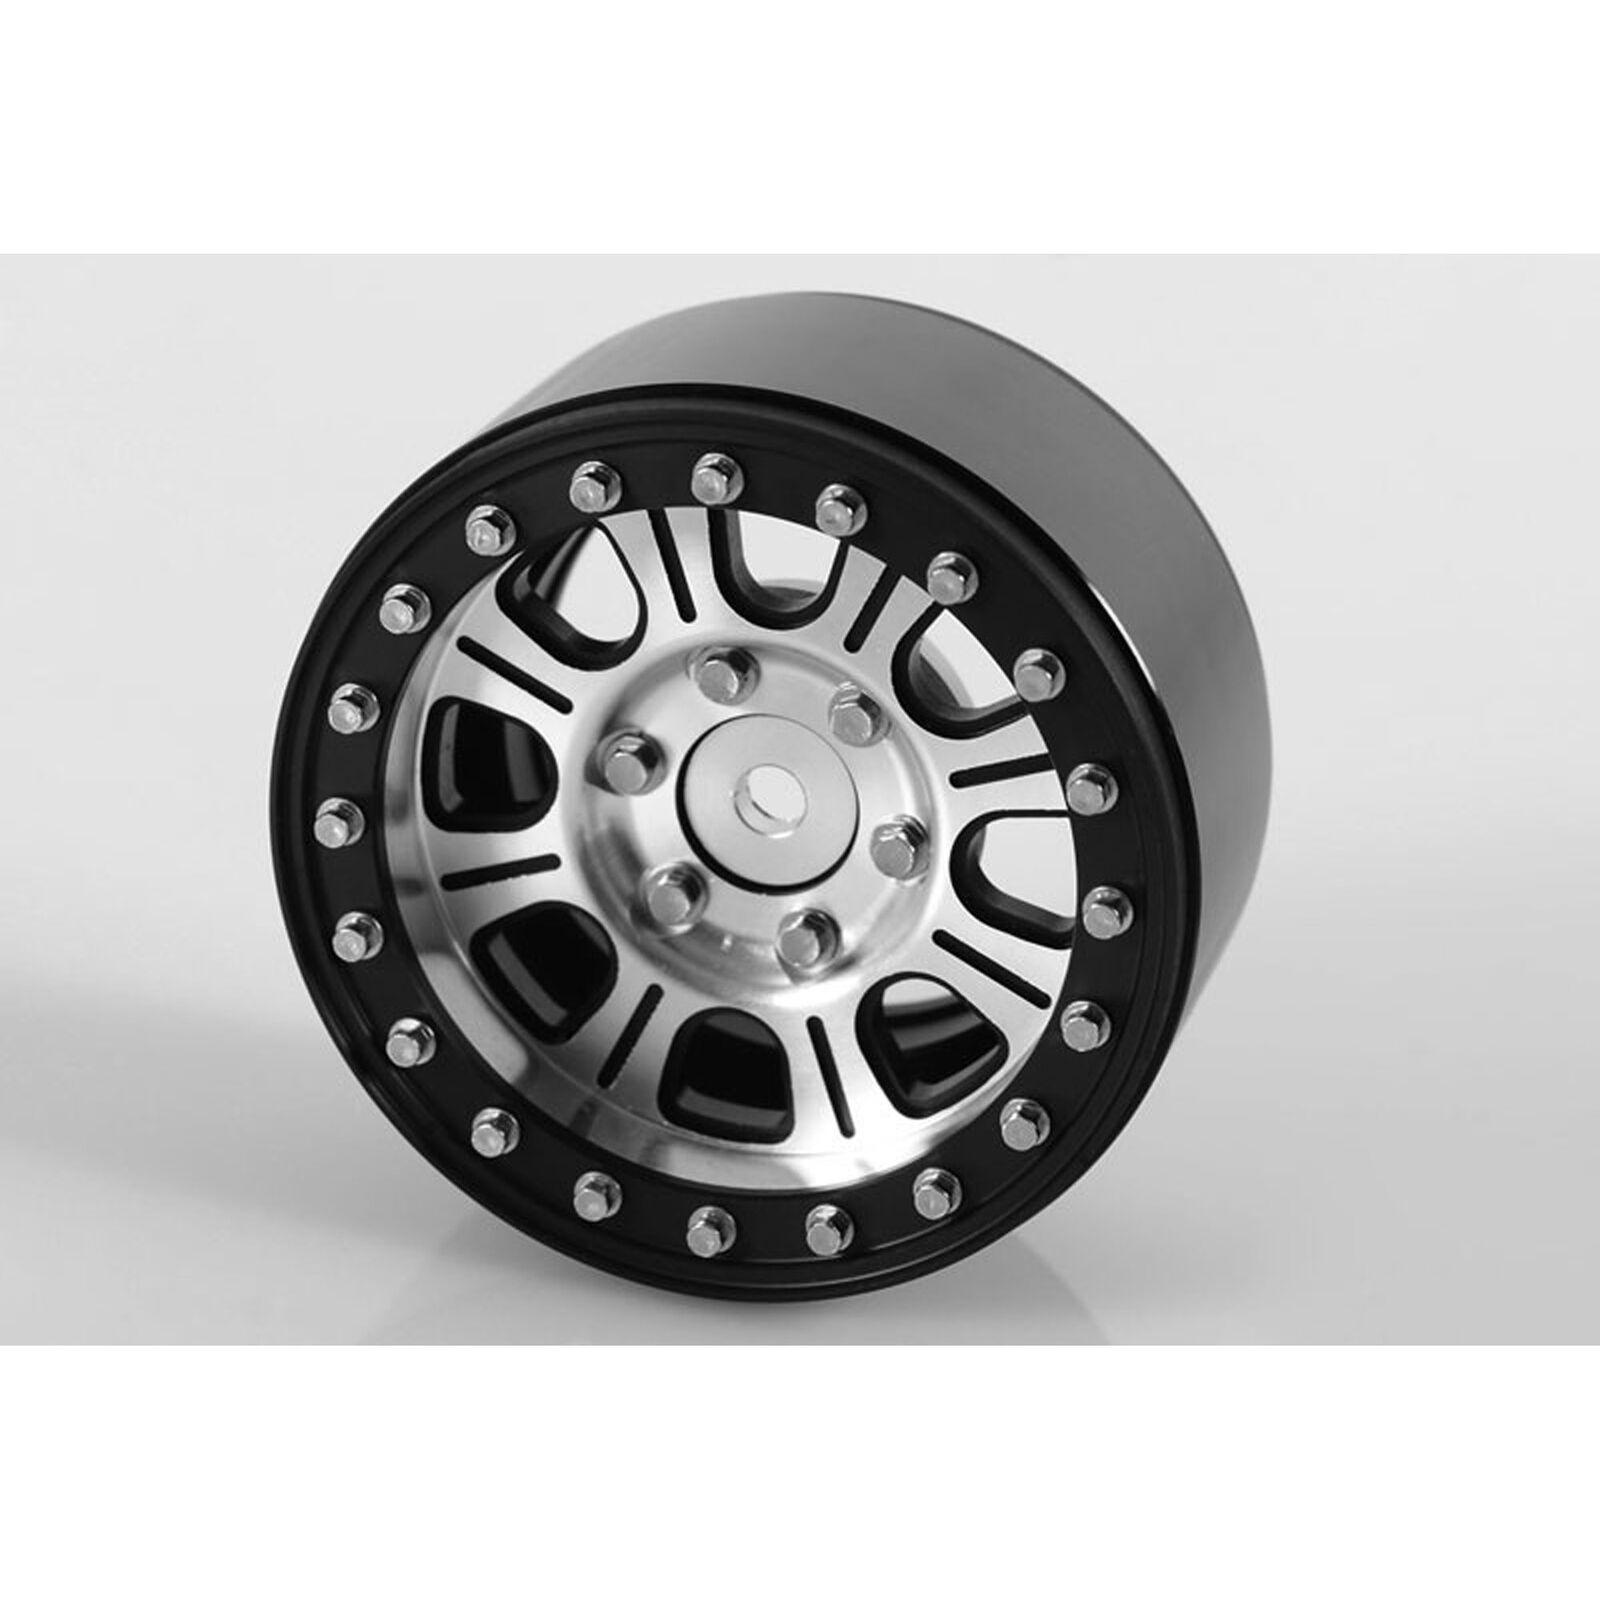 Raceline Monster 1.9 Beadlock Wheels (4)